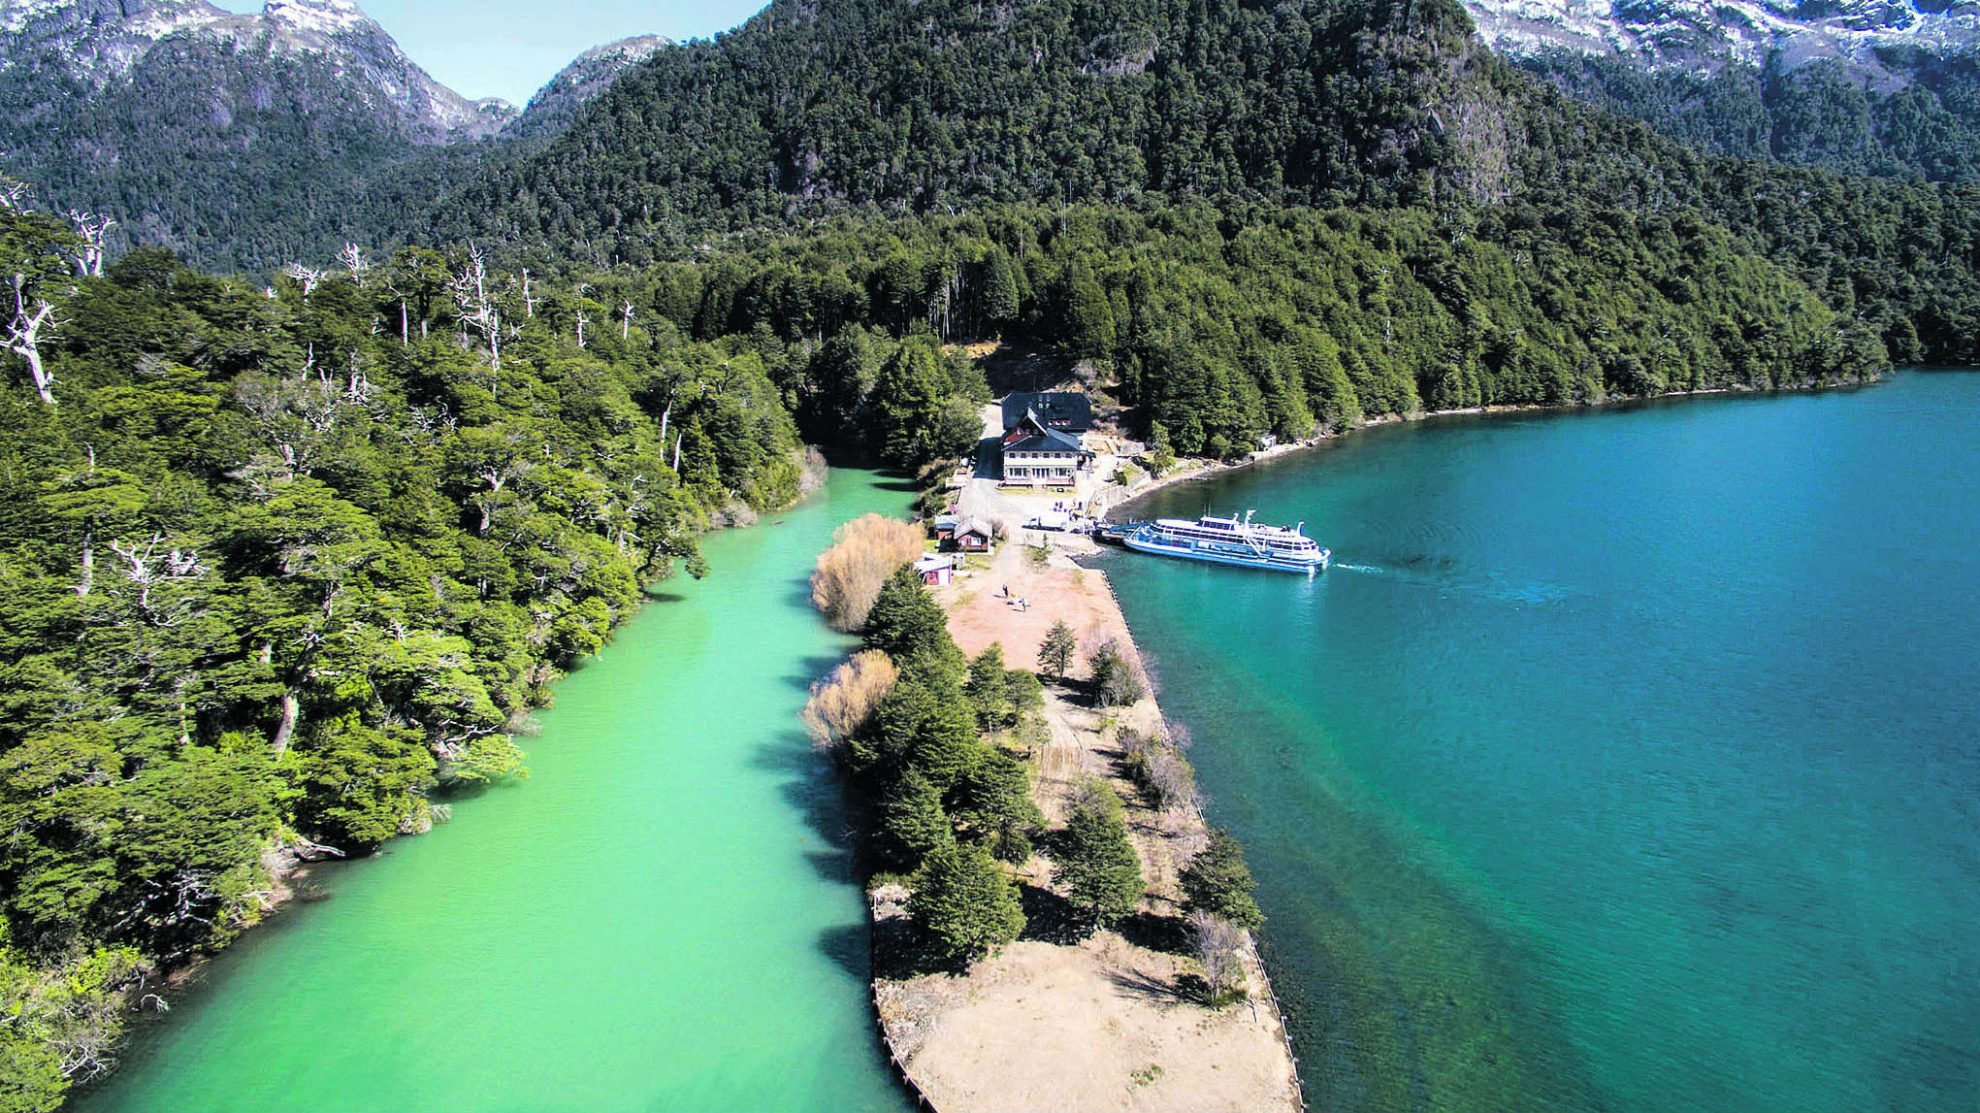 Cruce Andino 07 - Cruce Andino: como é a viagem de Bariloche a Puerto Varas